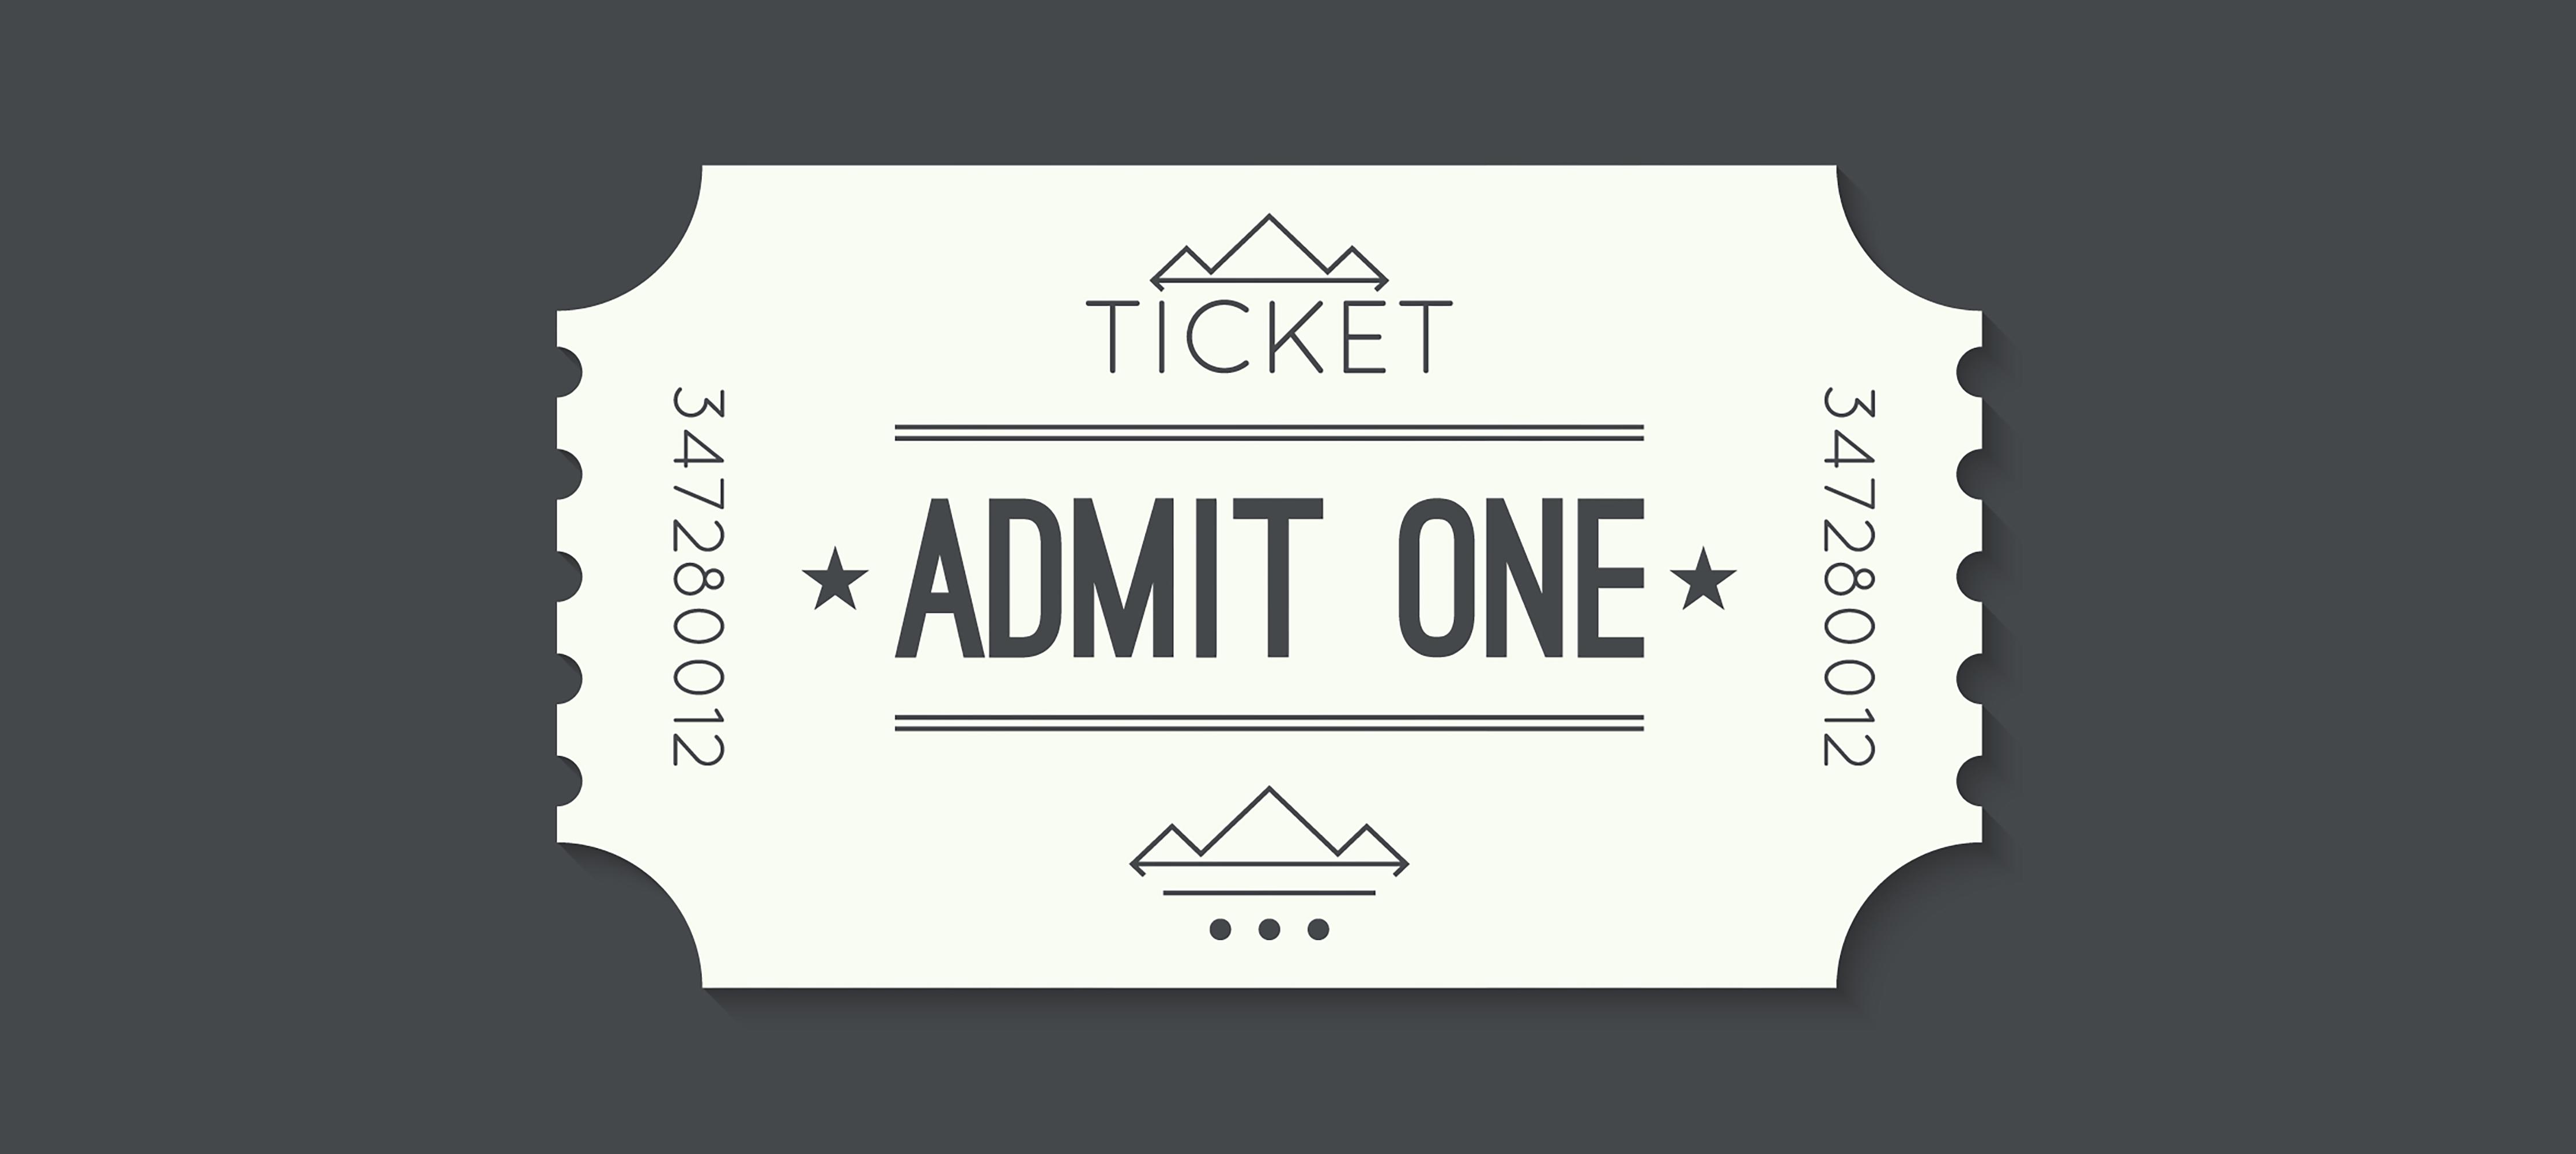 6 pro tips for ticket giveaways on social media eventbrite us blog ticket giveaways fandeluxe Gallery